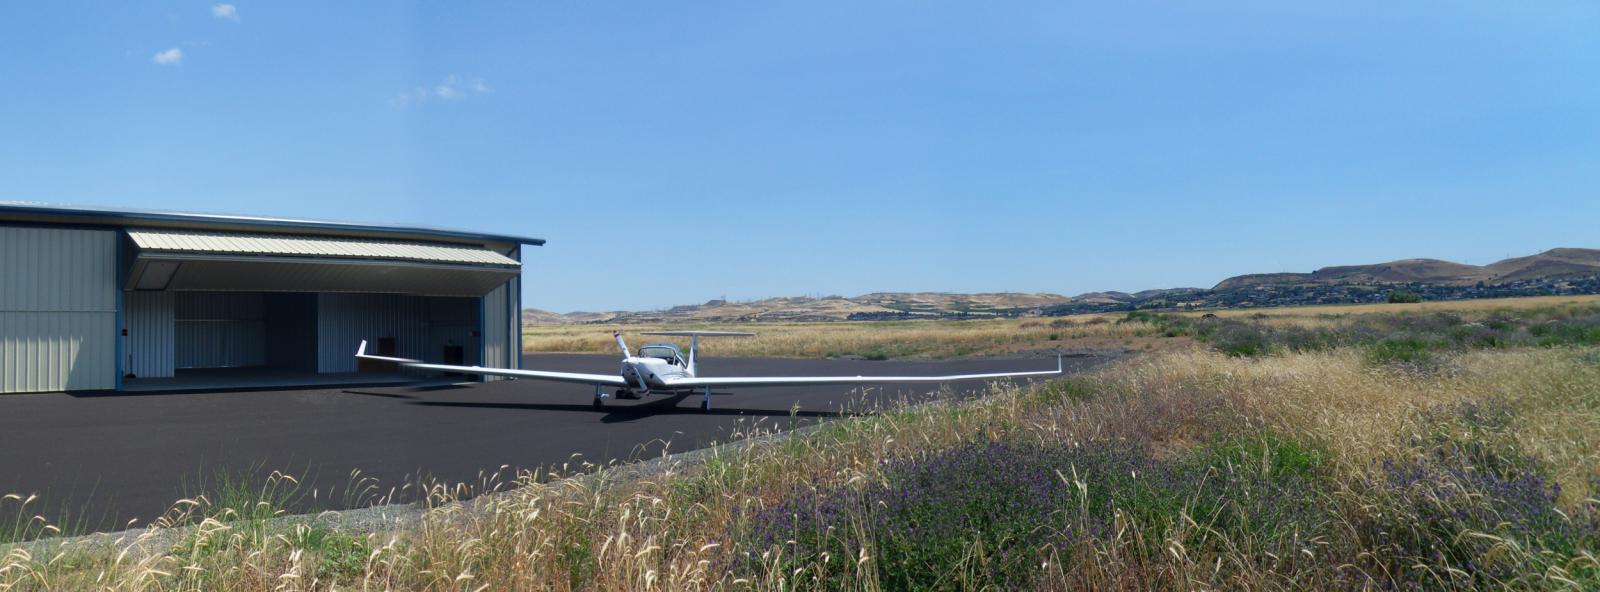 Arrival at Home - New Hangar